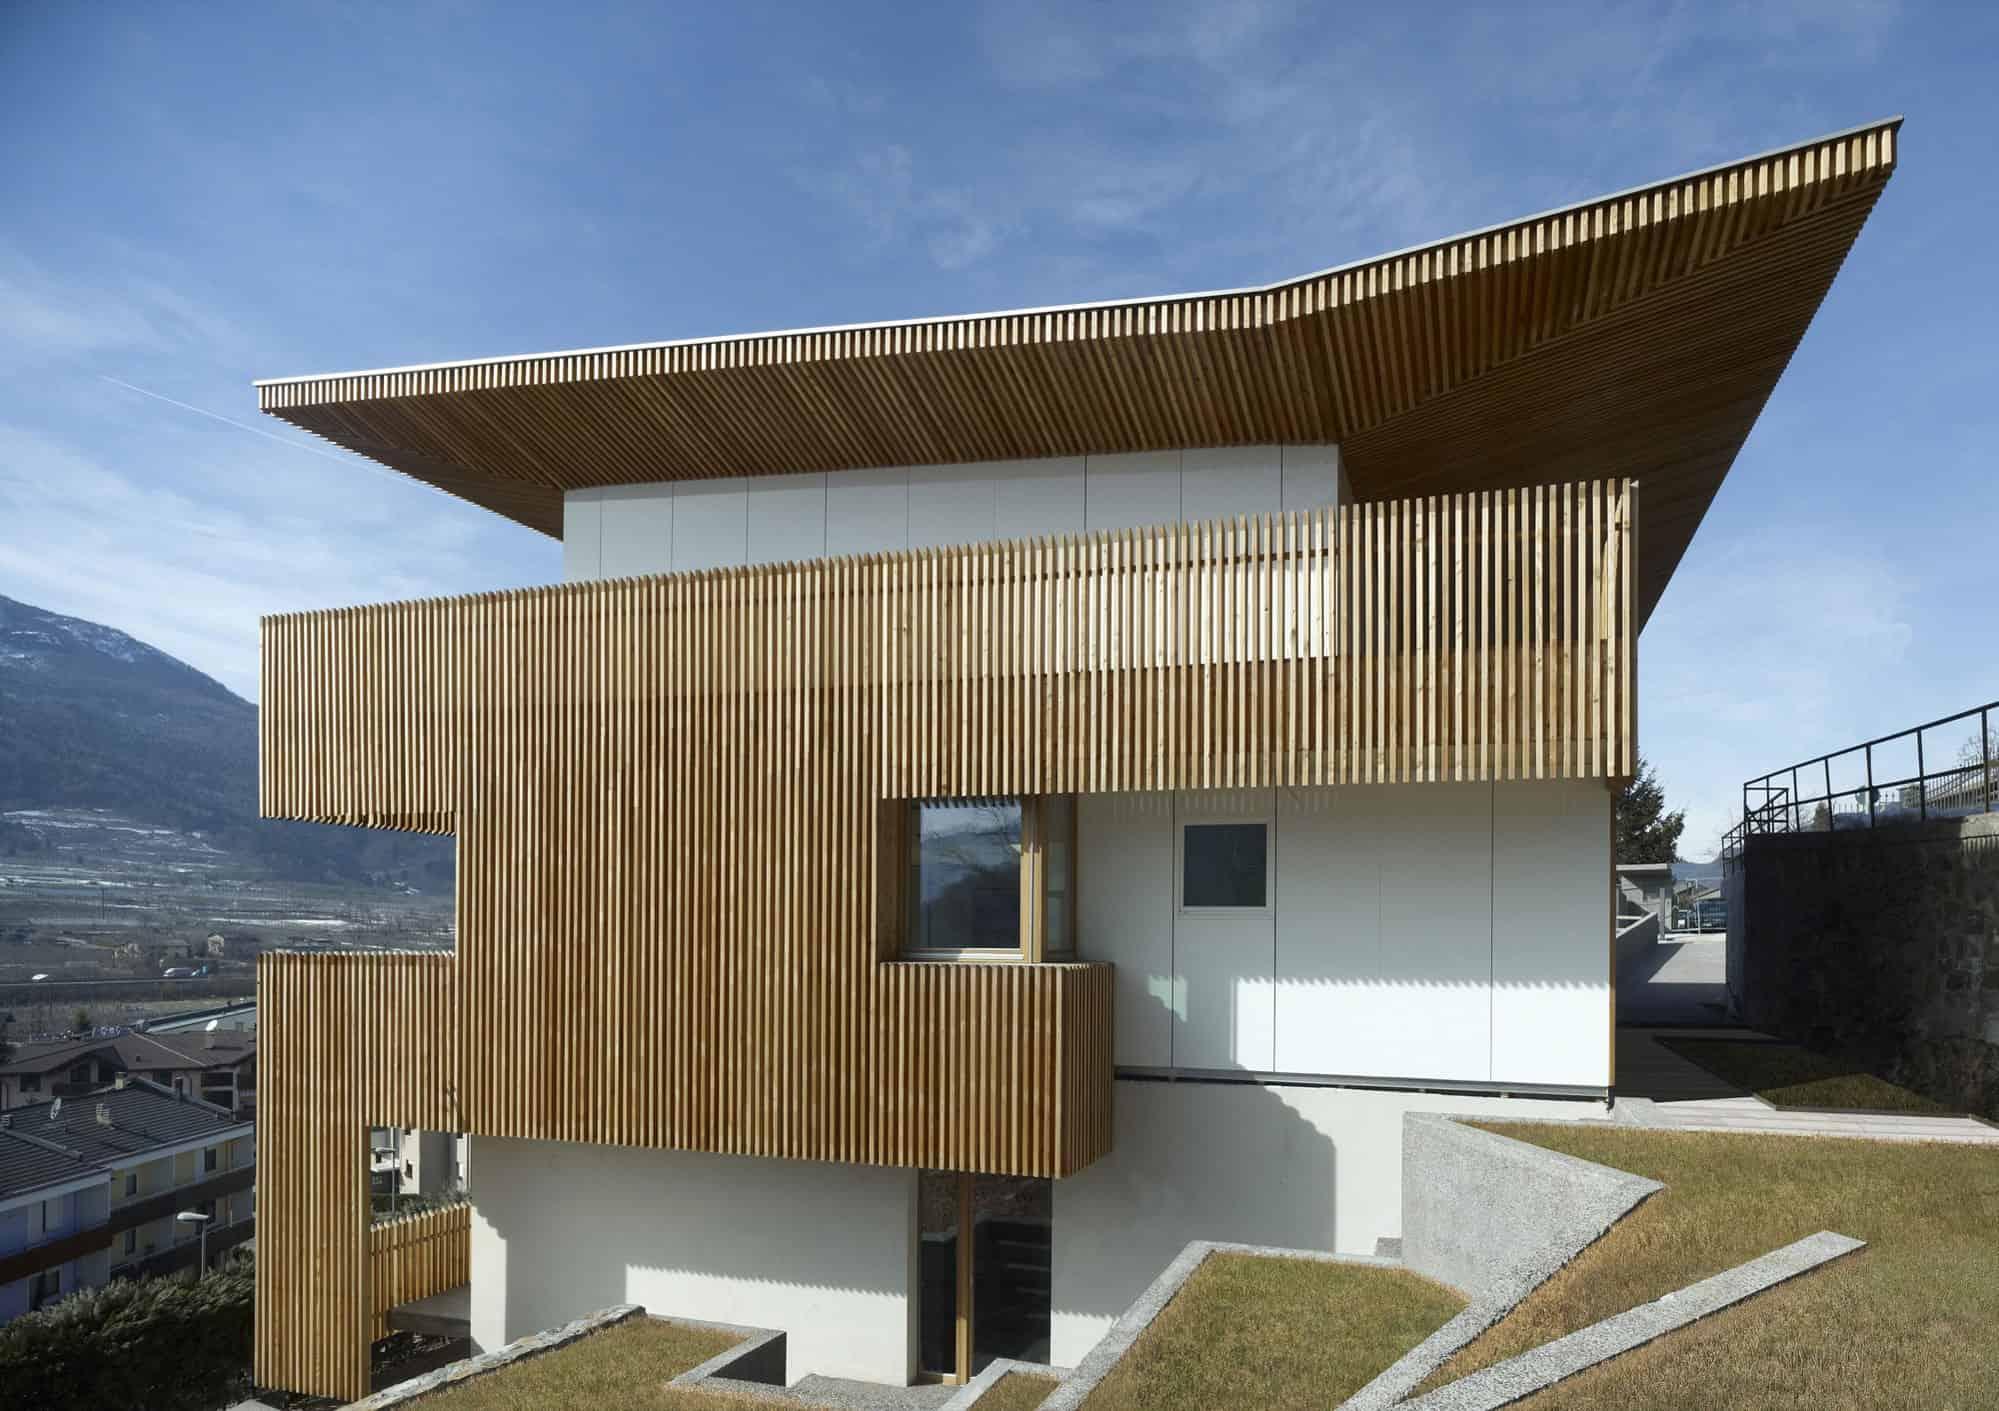 PF Single Family House by Burnazzi Feltrin Architects